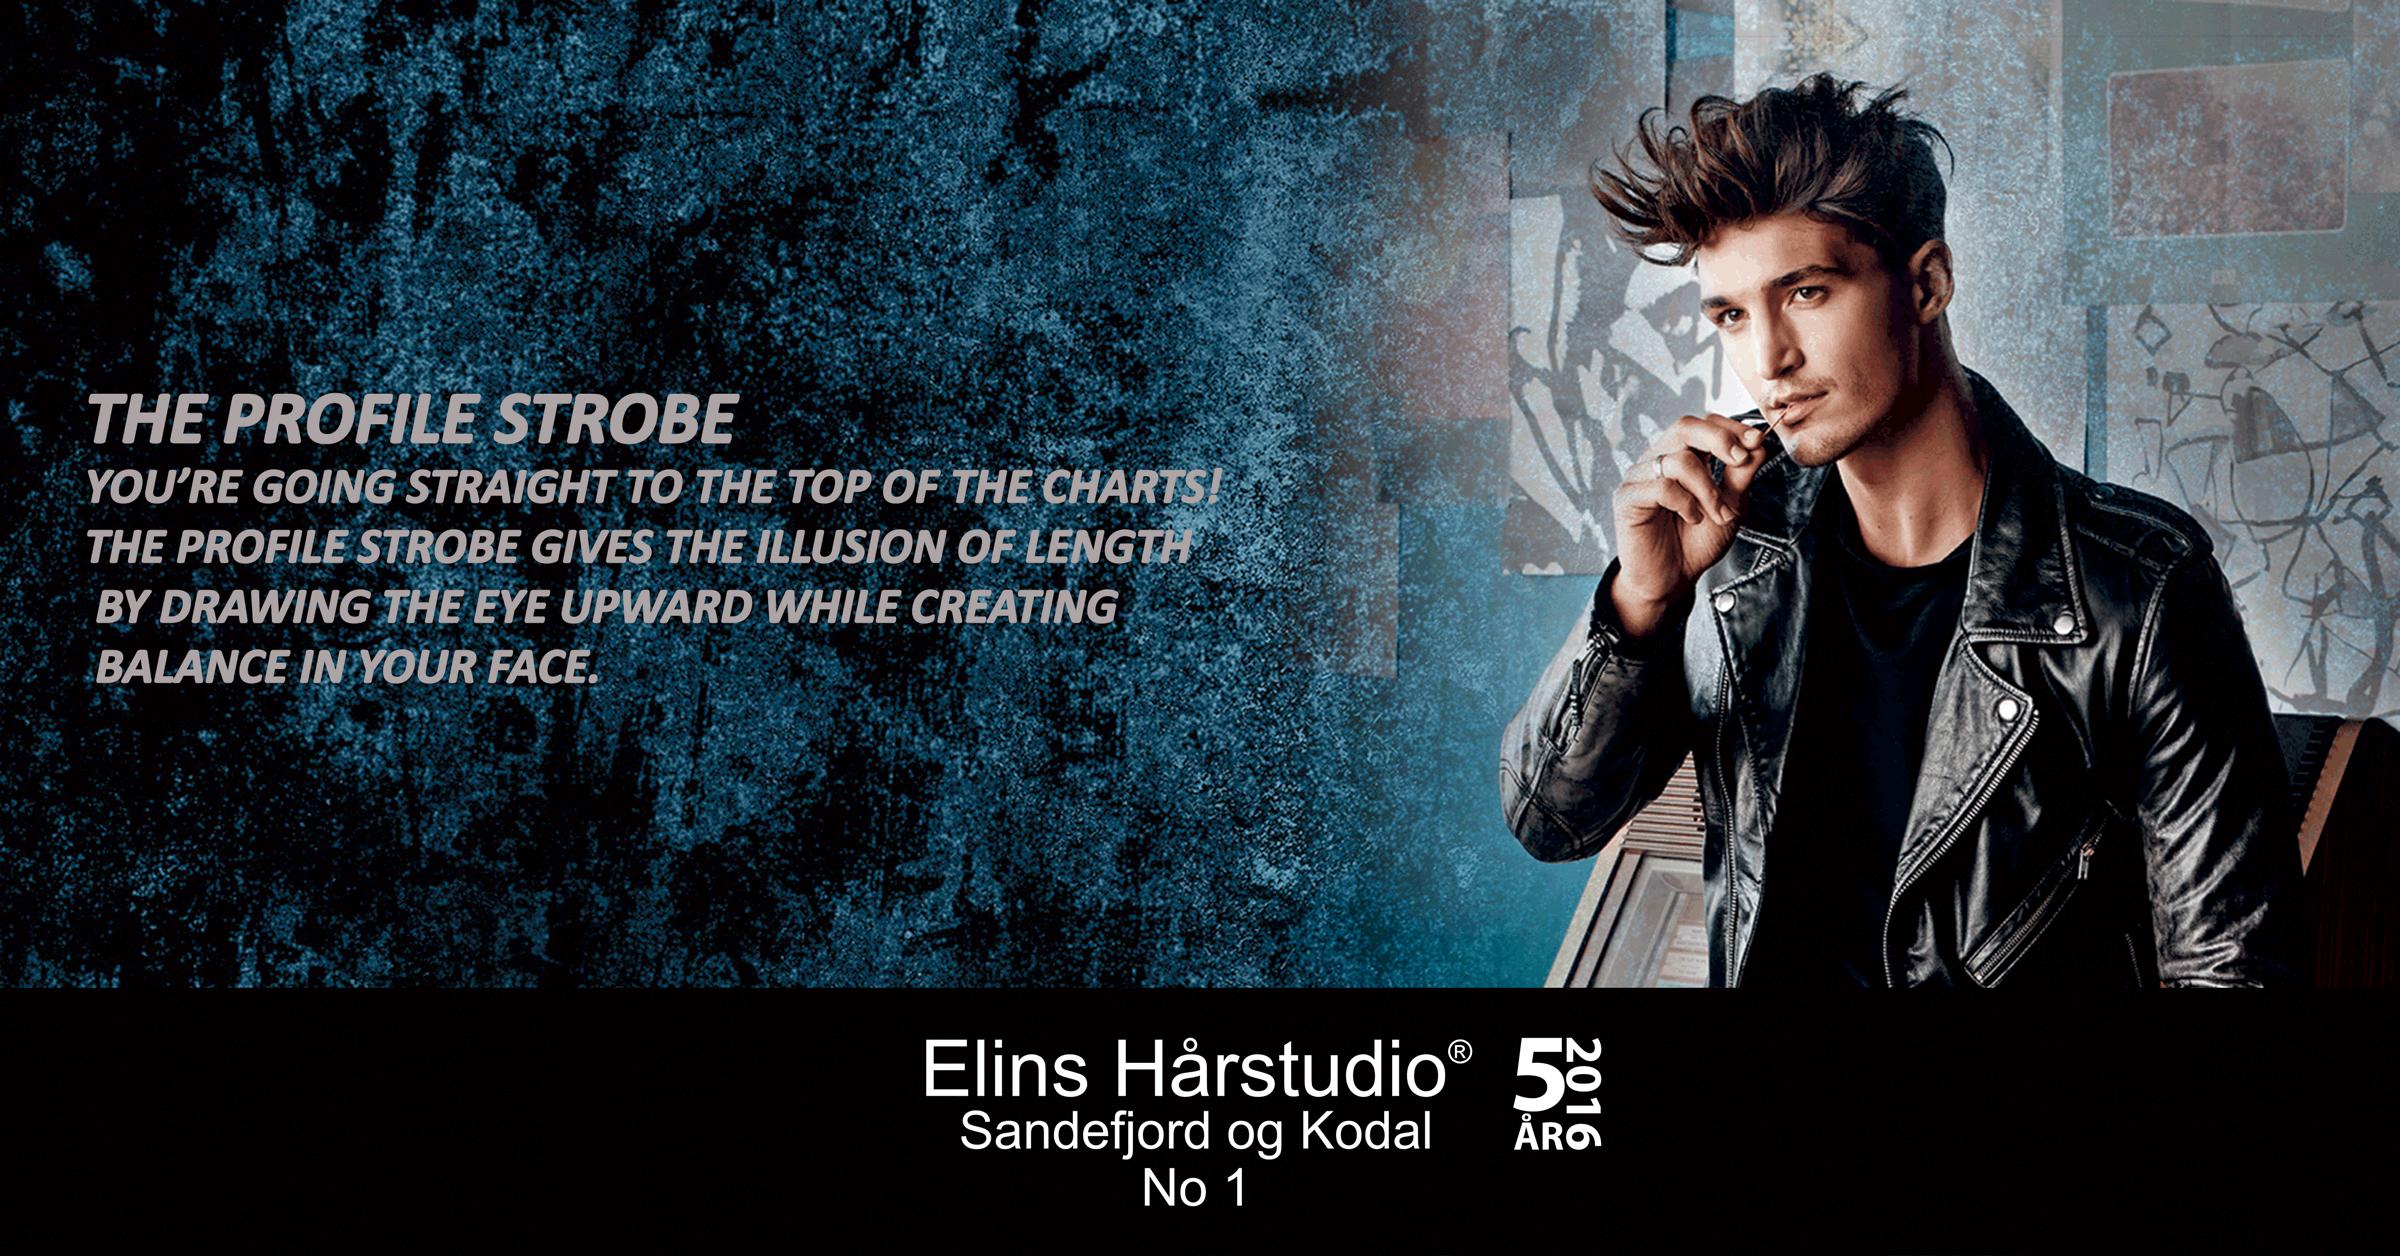 Hårmote Sommer 2016 Rock N Strobe By Matrix the profile strobe